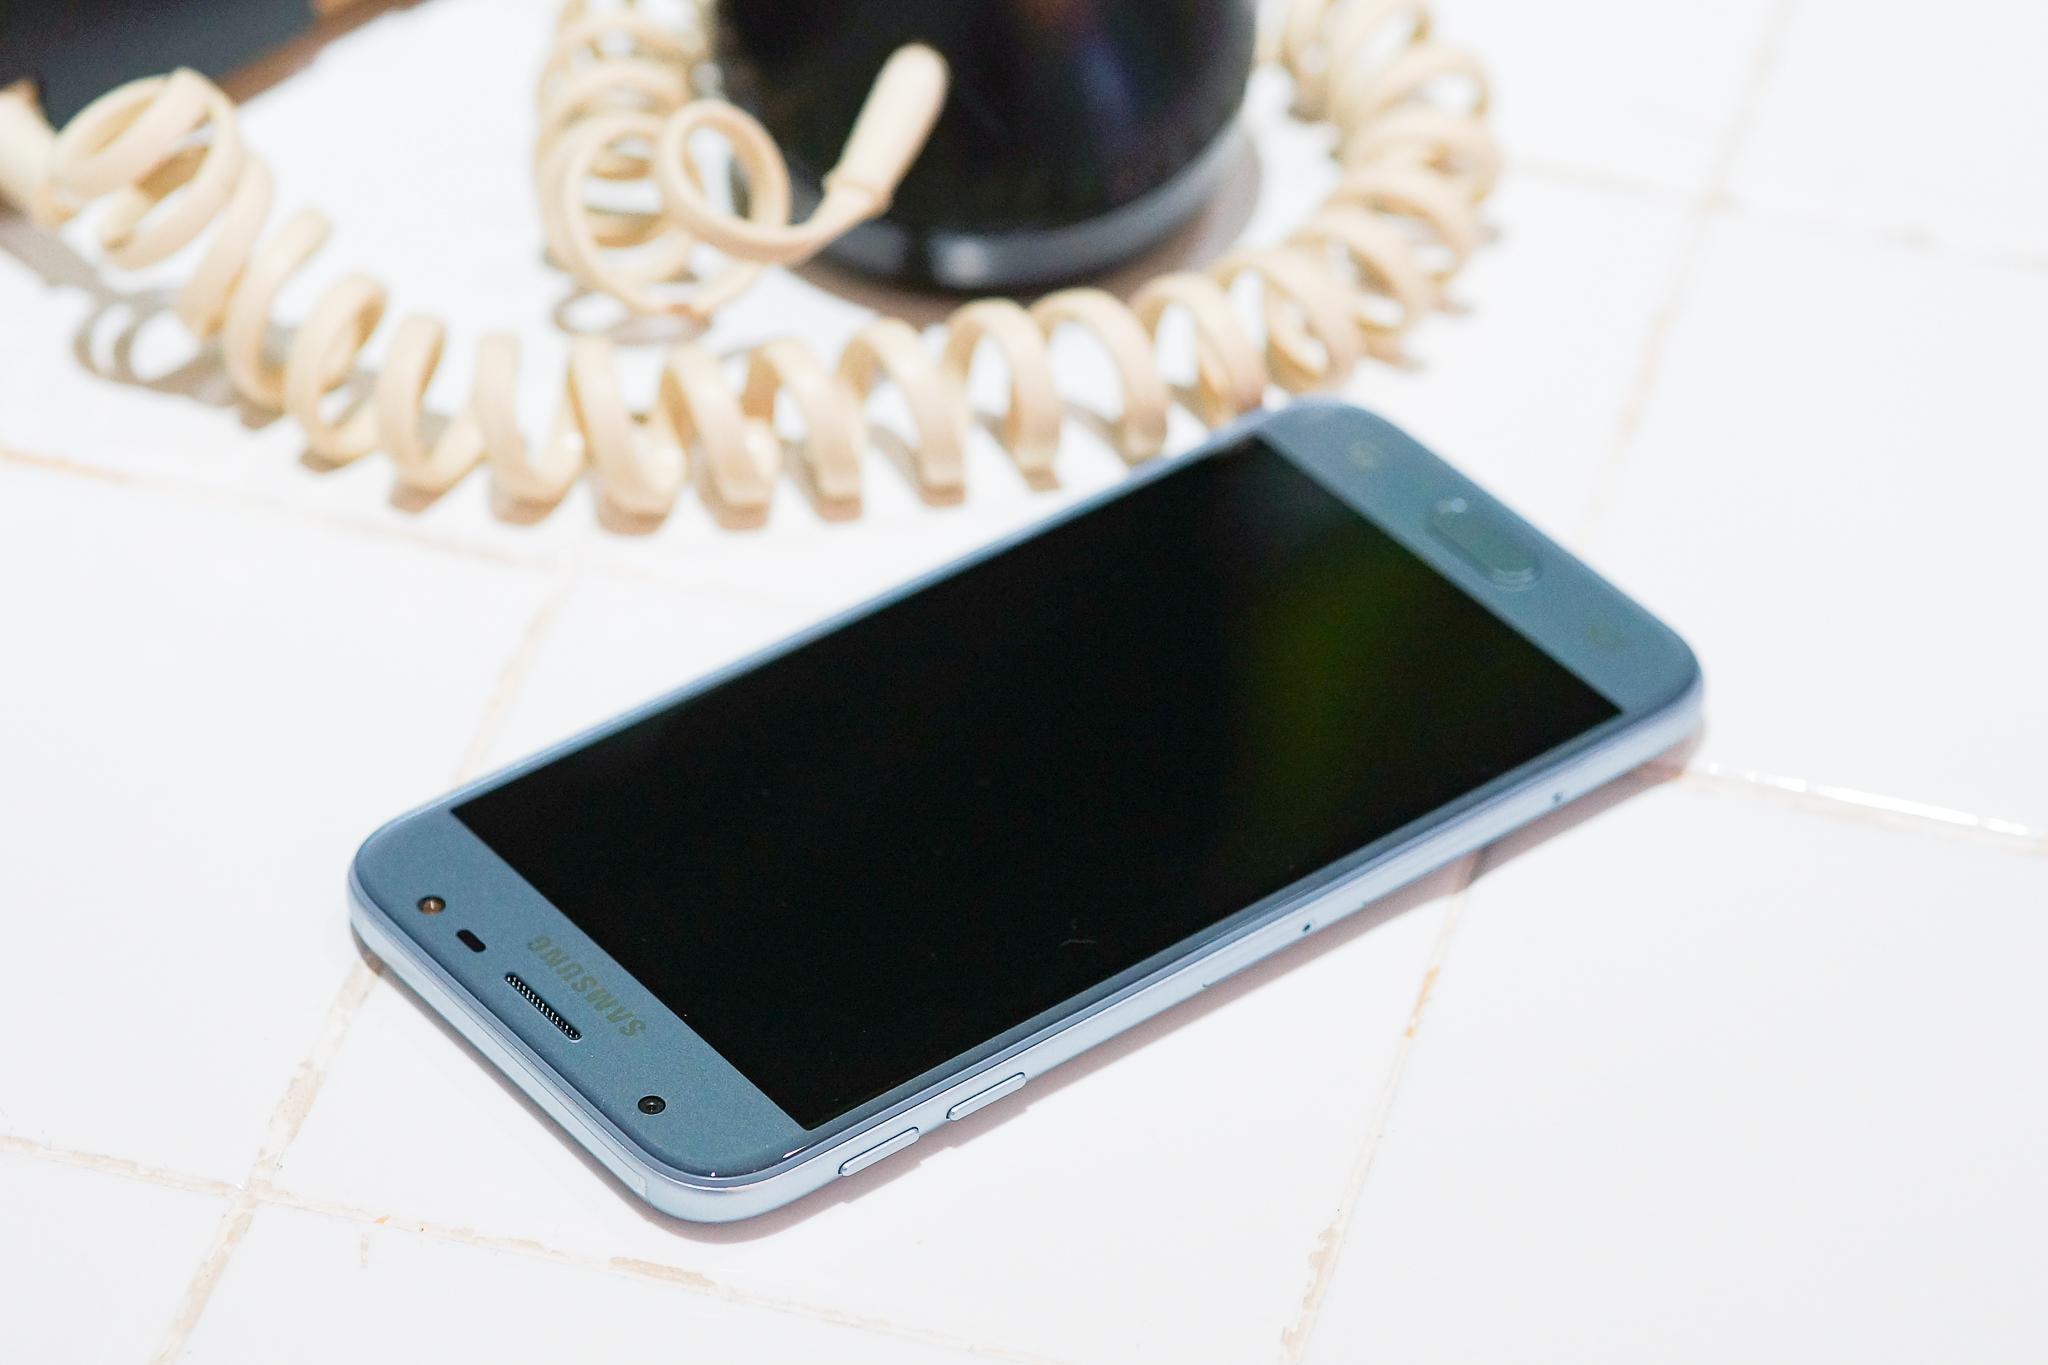 Samsung J3 Pro - Hình 3